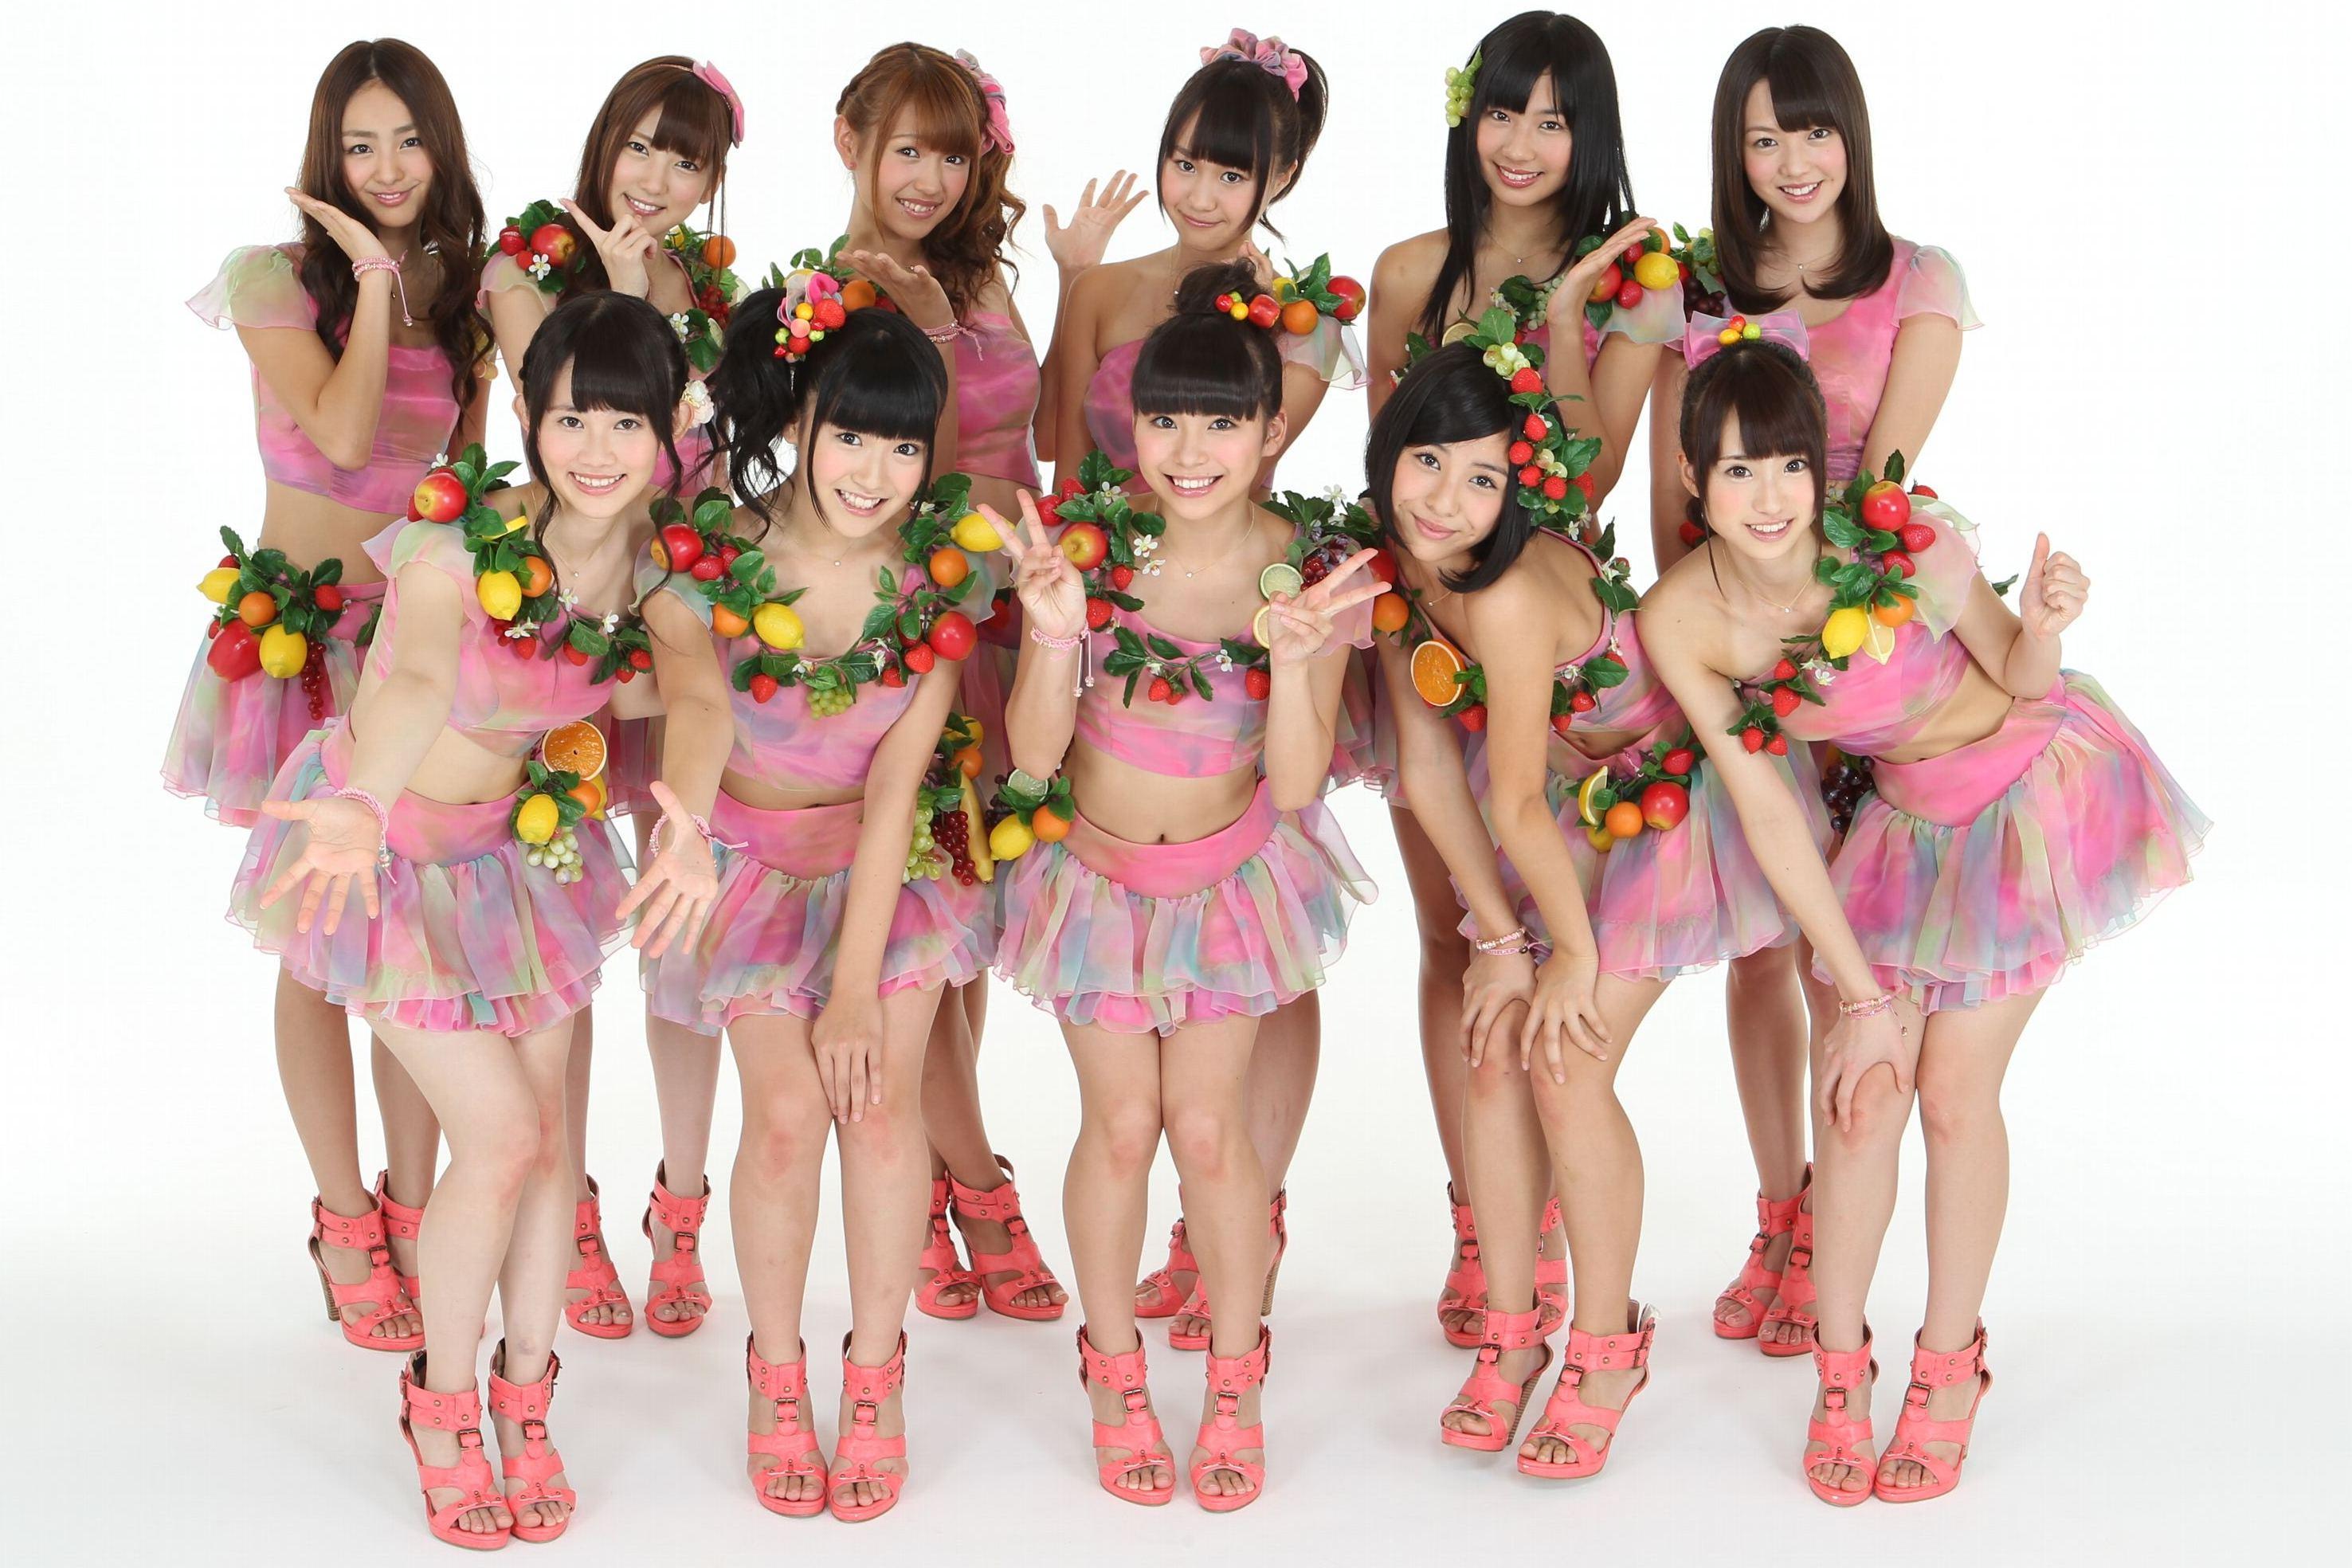 SUPER☆GiRLSはエイベックスのアイドルグループで人気急上昇中です!